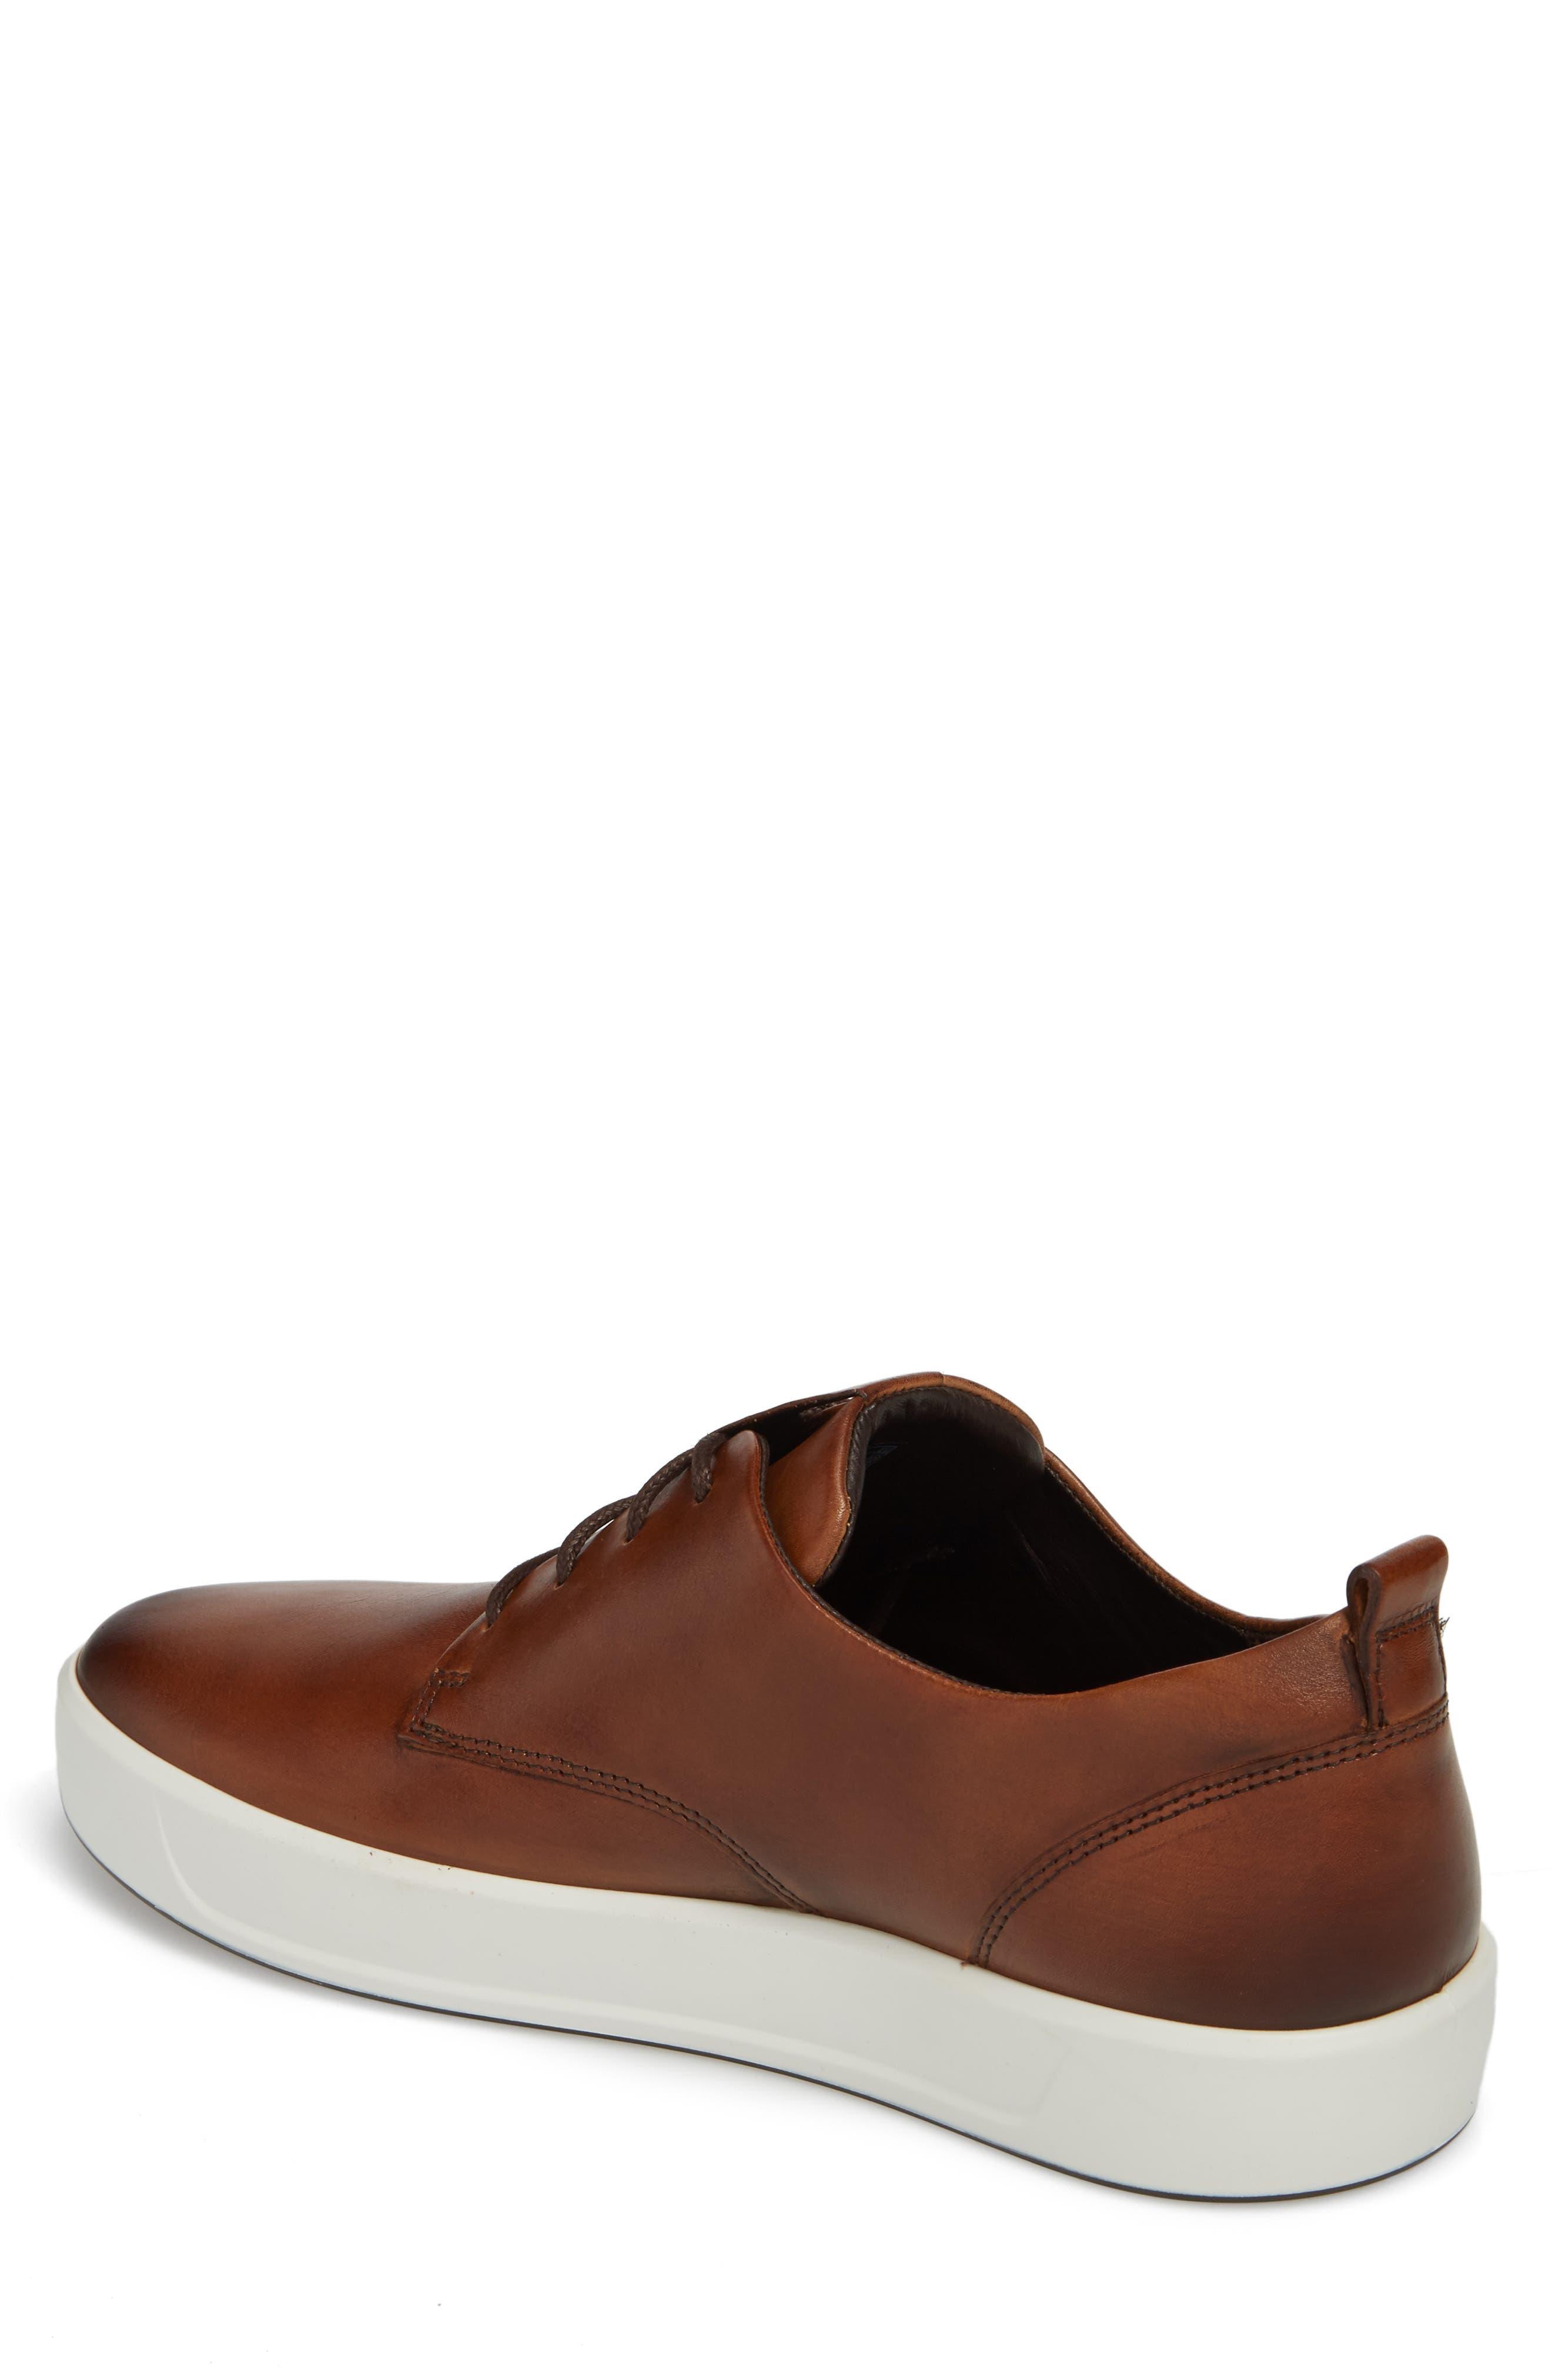 Soft 8 Street Sneaker,                             Alternate thumbnail 2, color,                             Lion Leather